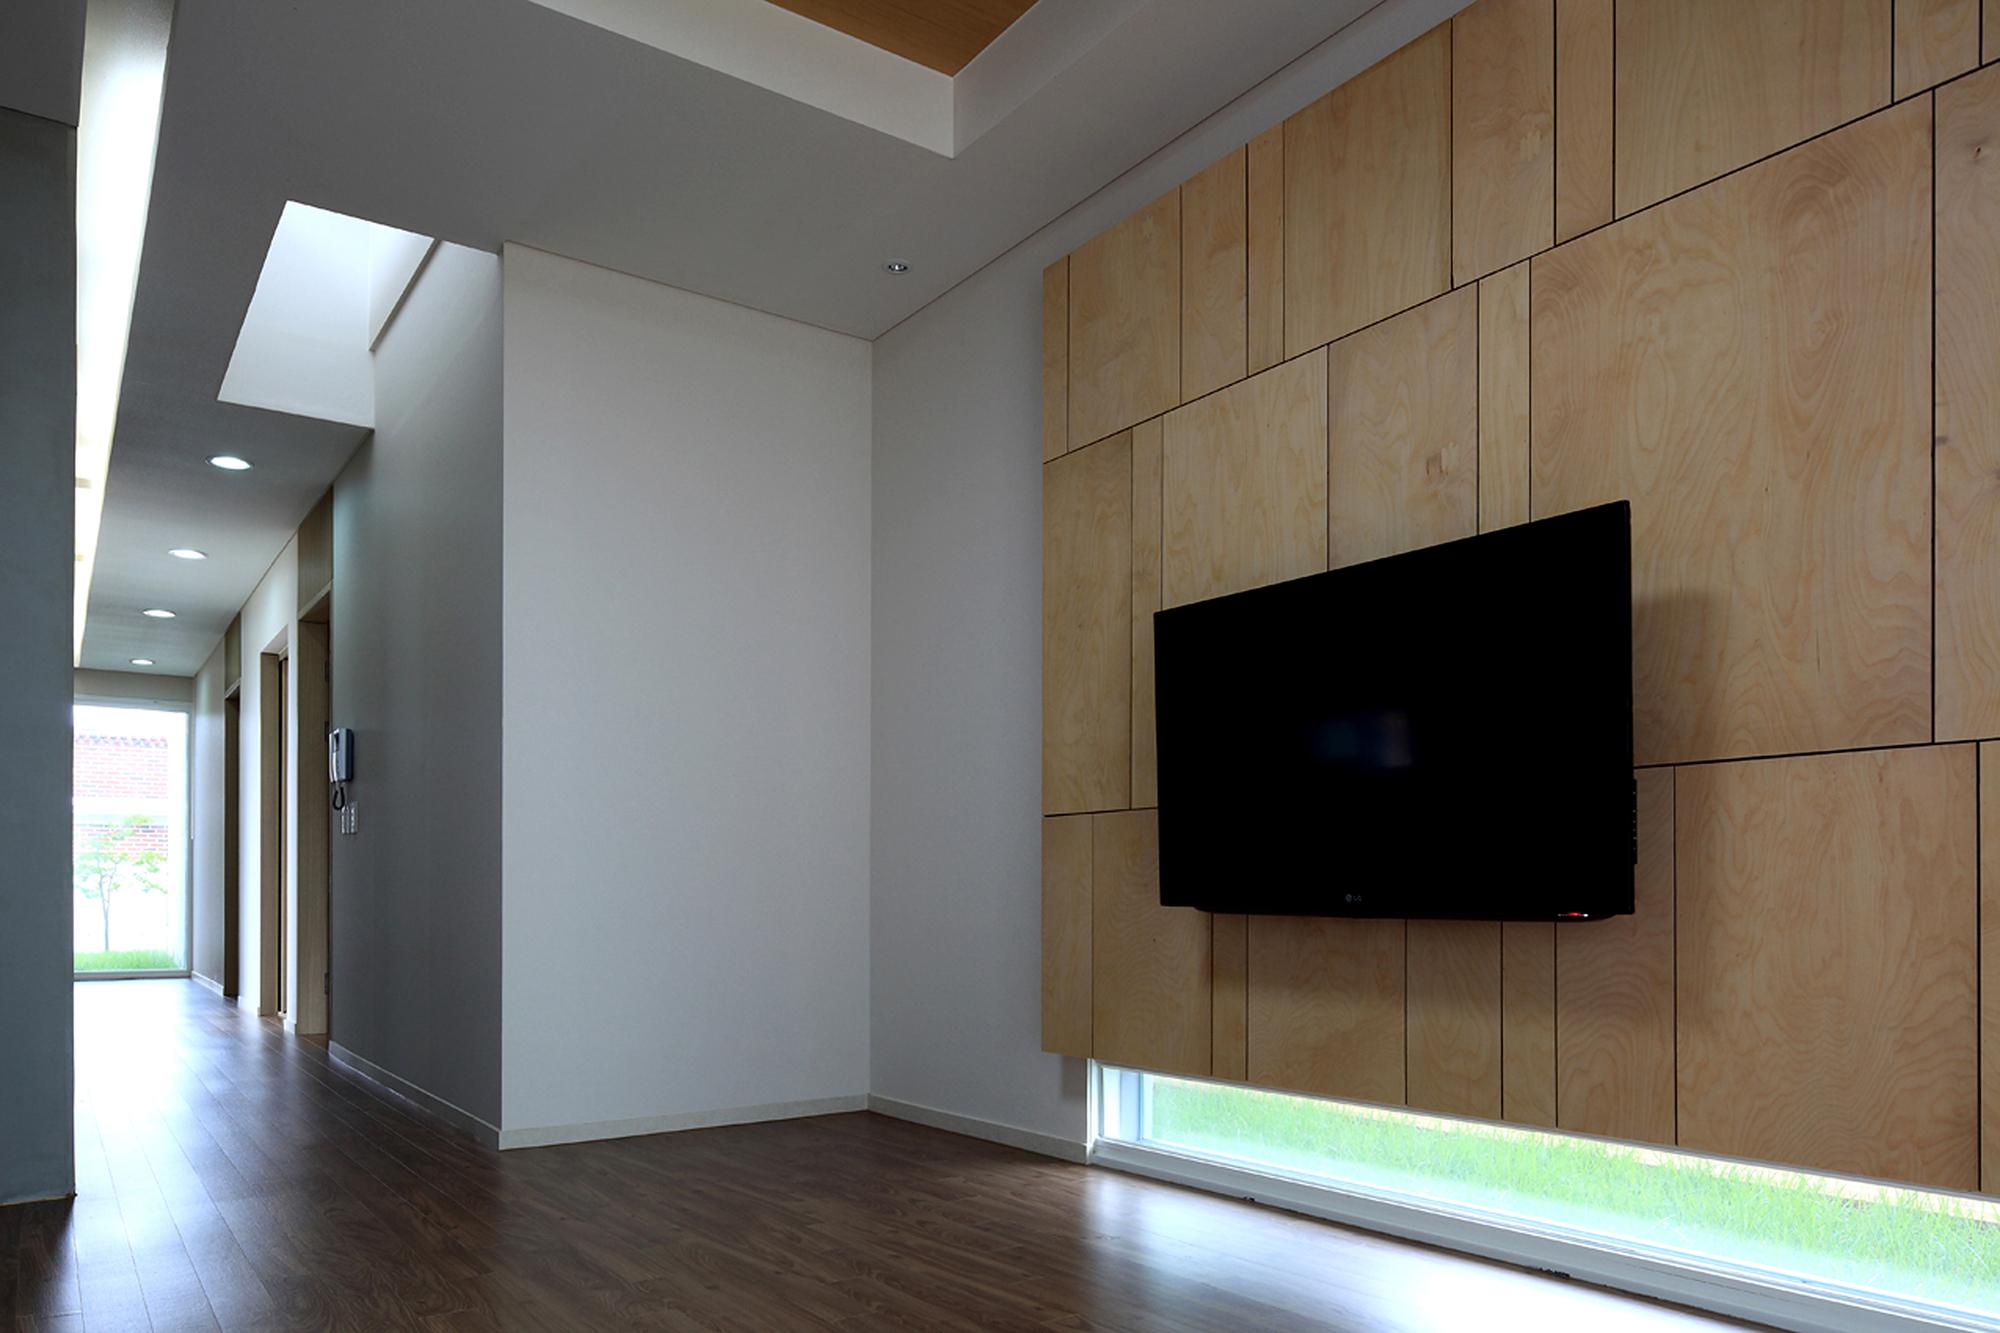 52f1a5fde8e44e61110000c2_mun-jeong-heon-a-m-architects_a8